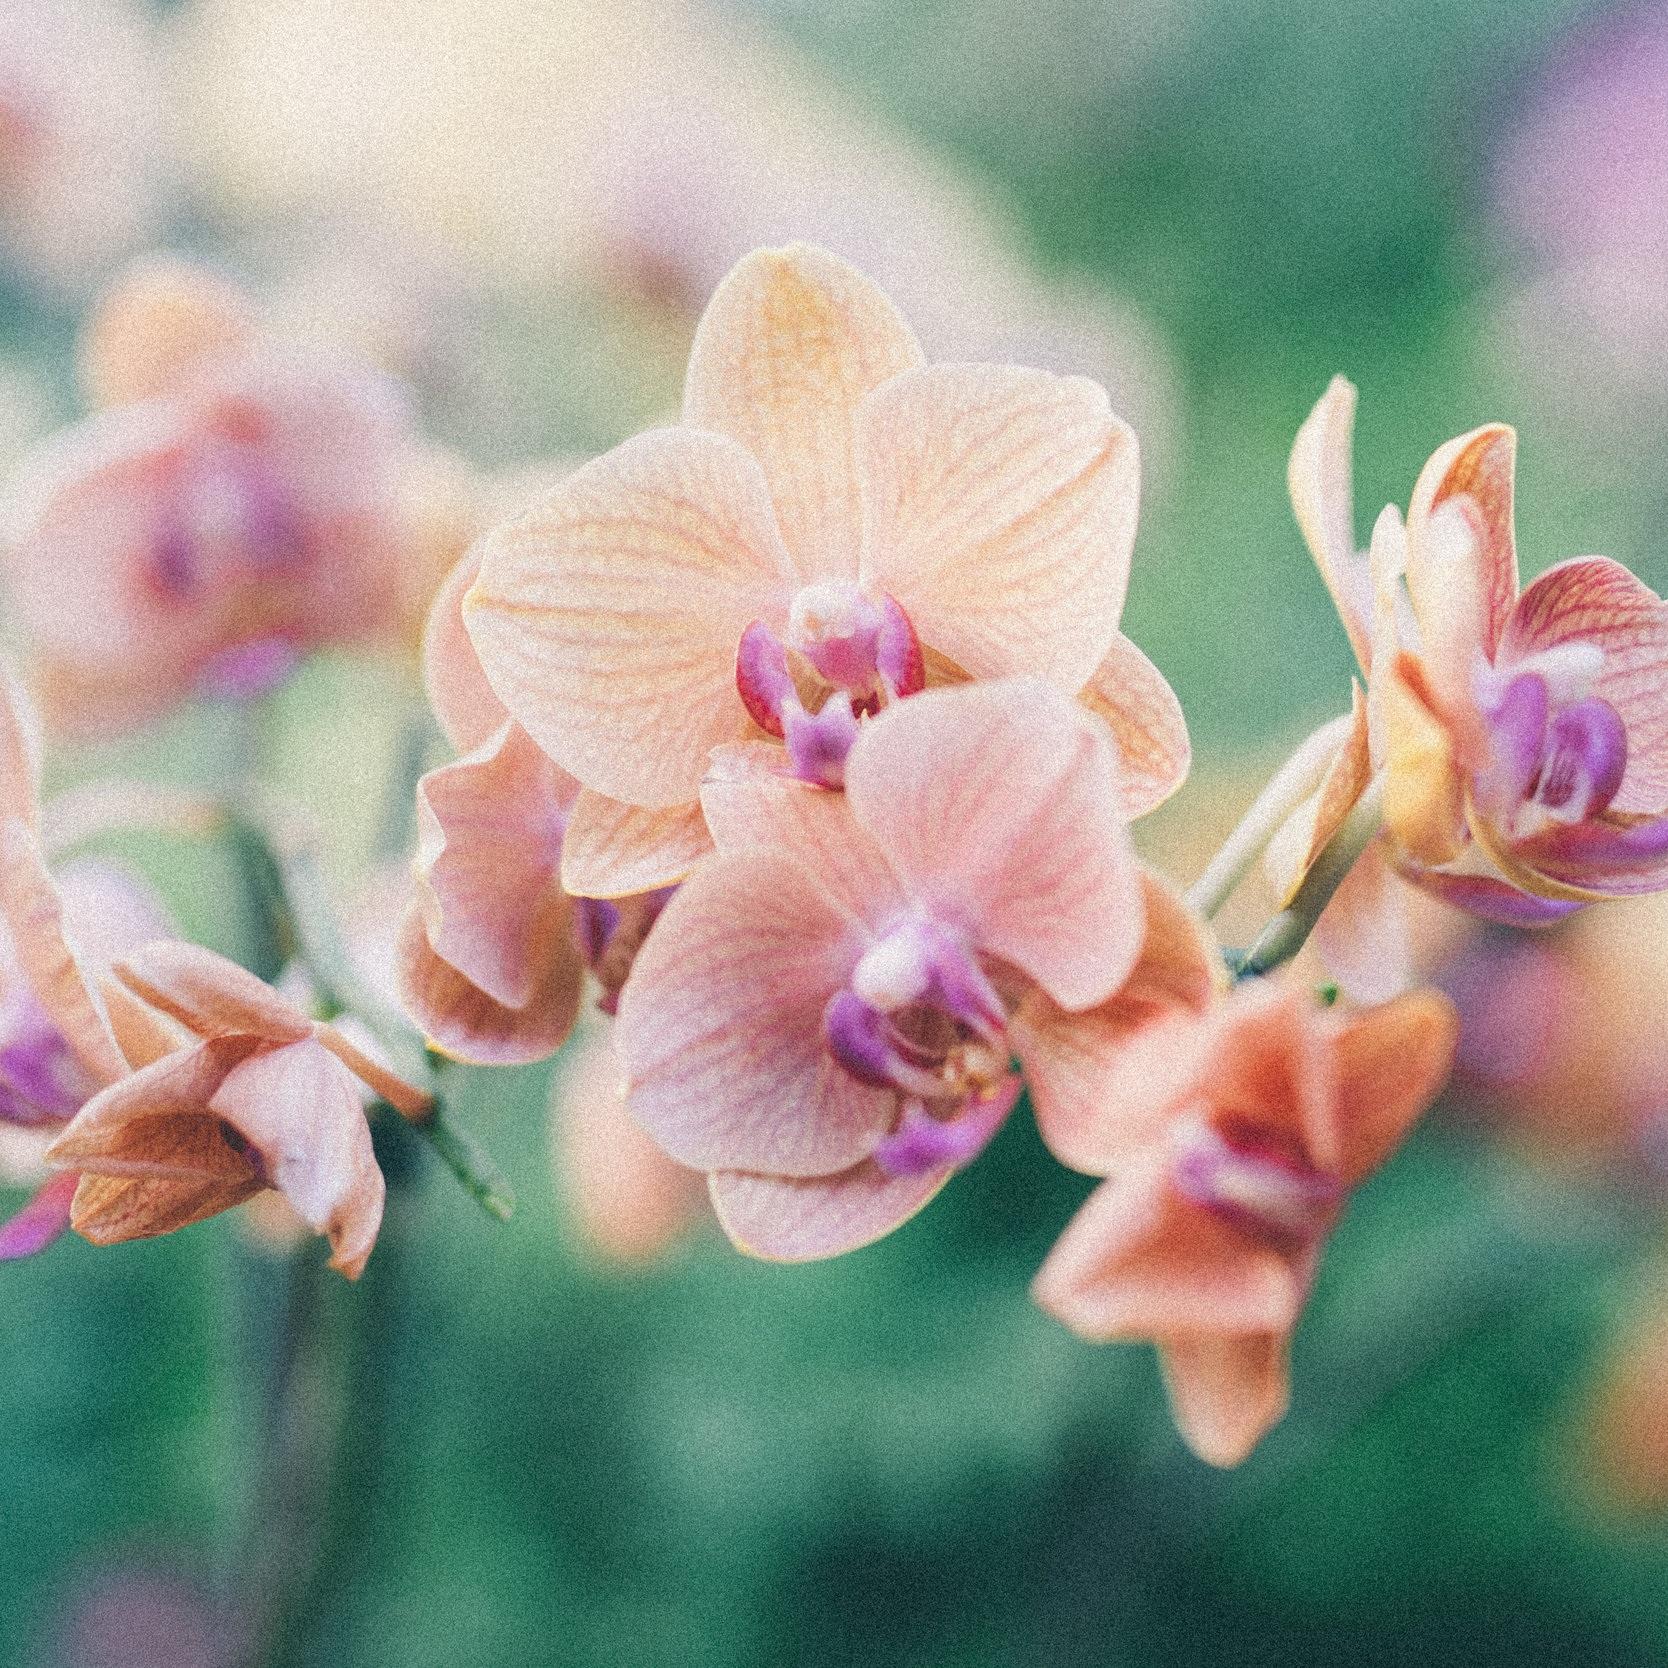 Marama Flower Essences - Shop our flower elixir or co-create your own bespoke essence.